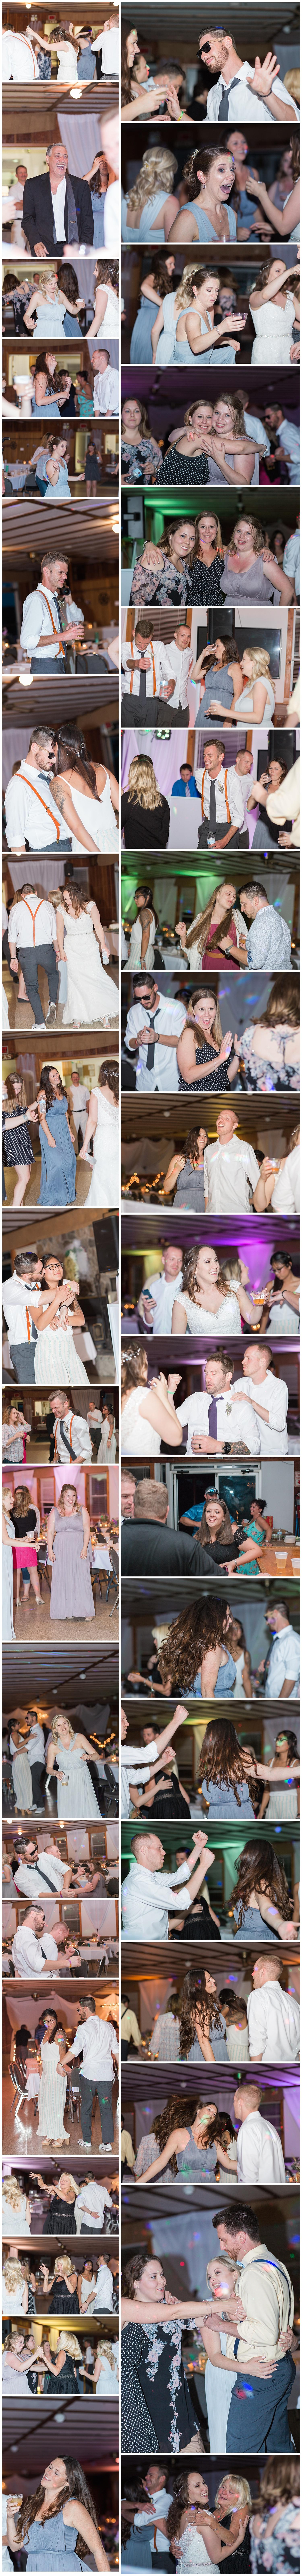 The Martin wedding - Lass & Beau-2164_Buffalo wedding photography.jpg